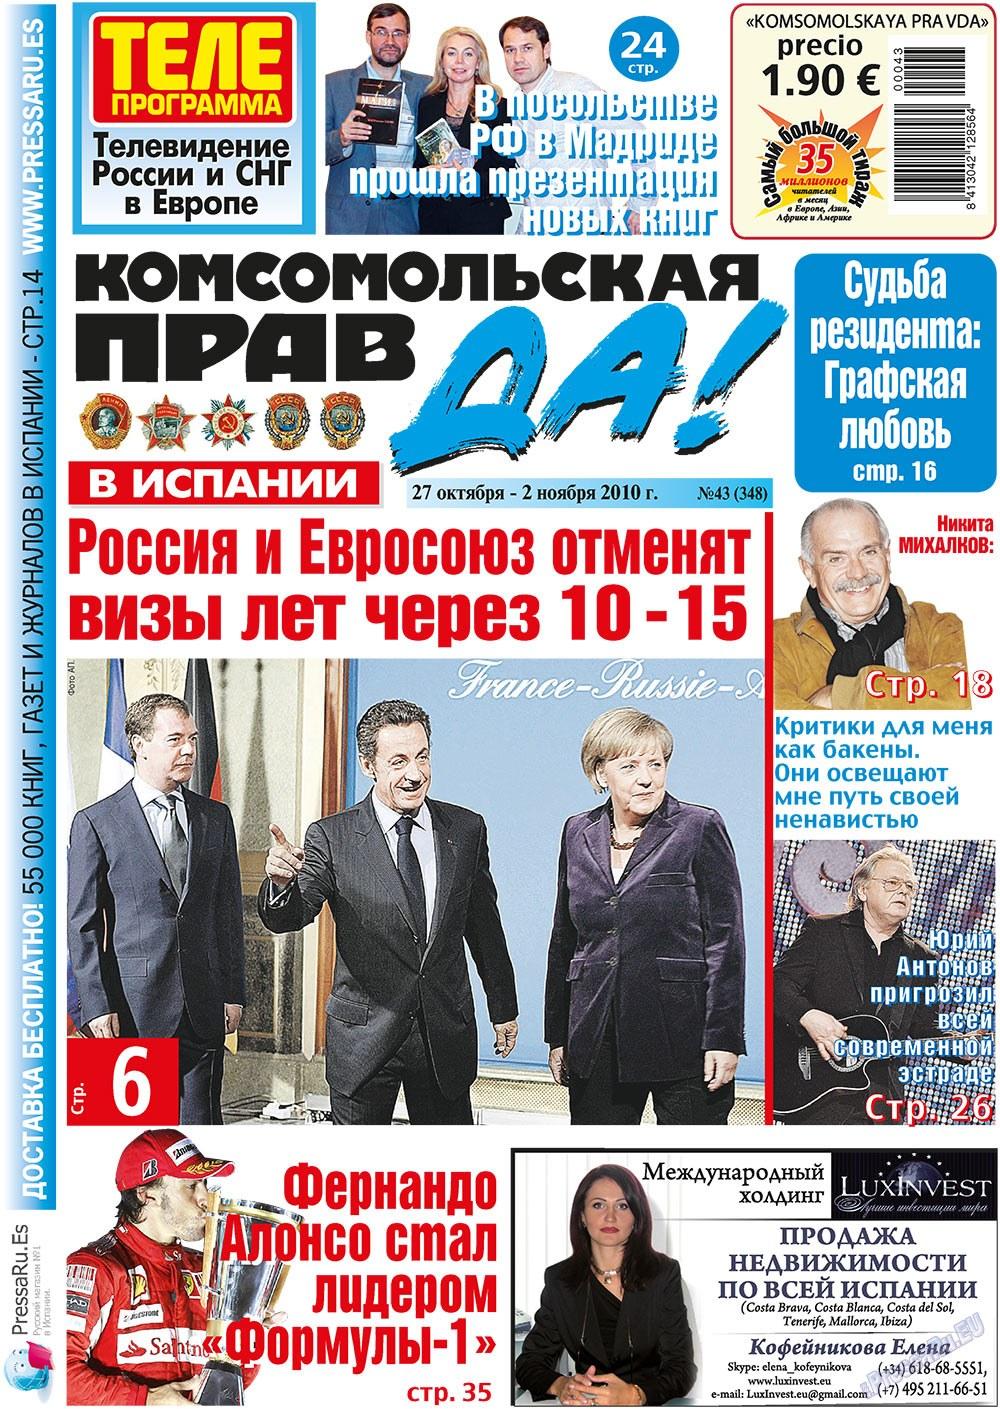 КП Испания (газета). 2010 год, номер 43, стр. 1